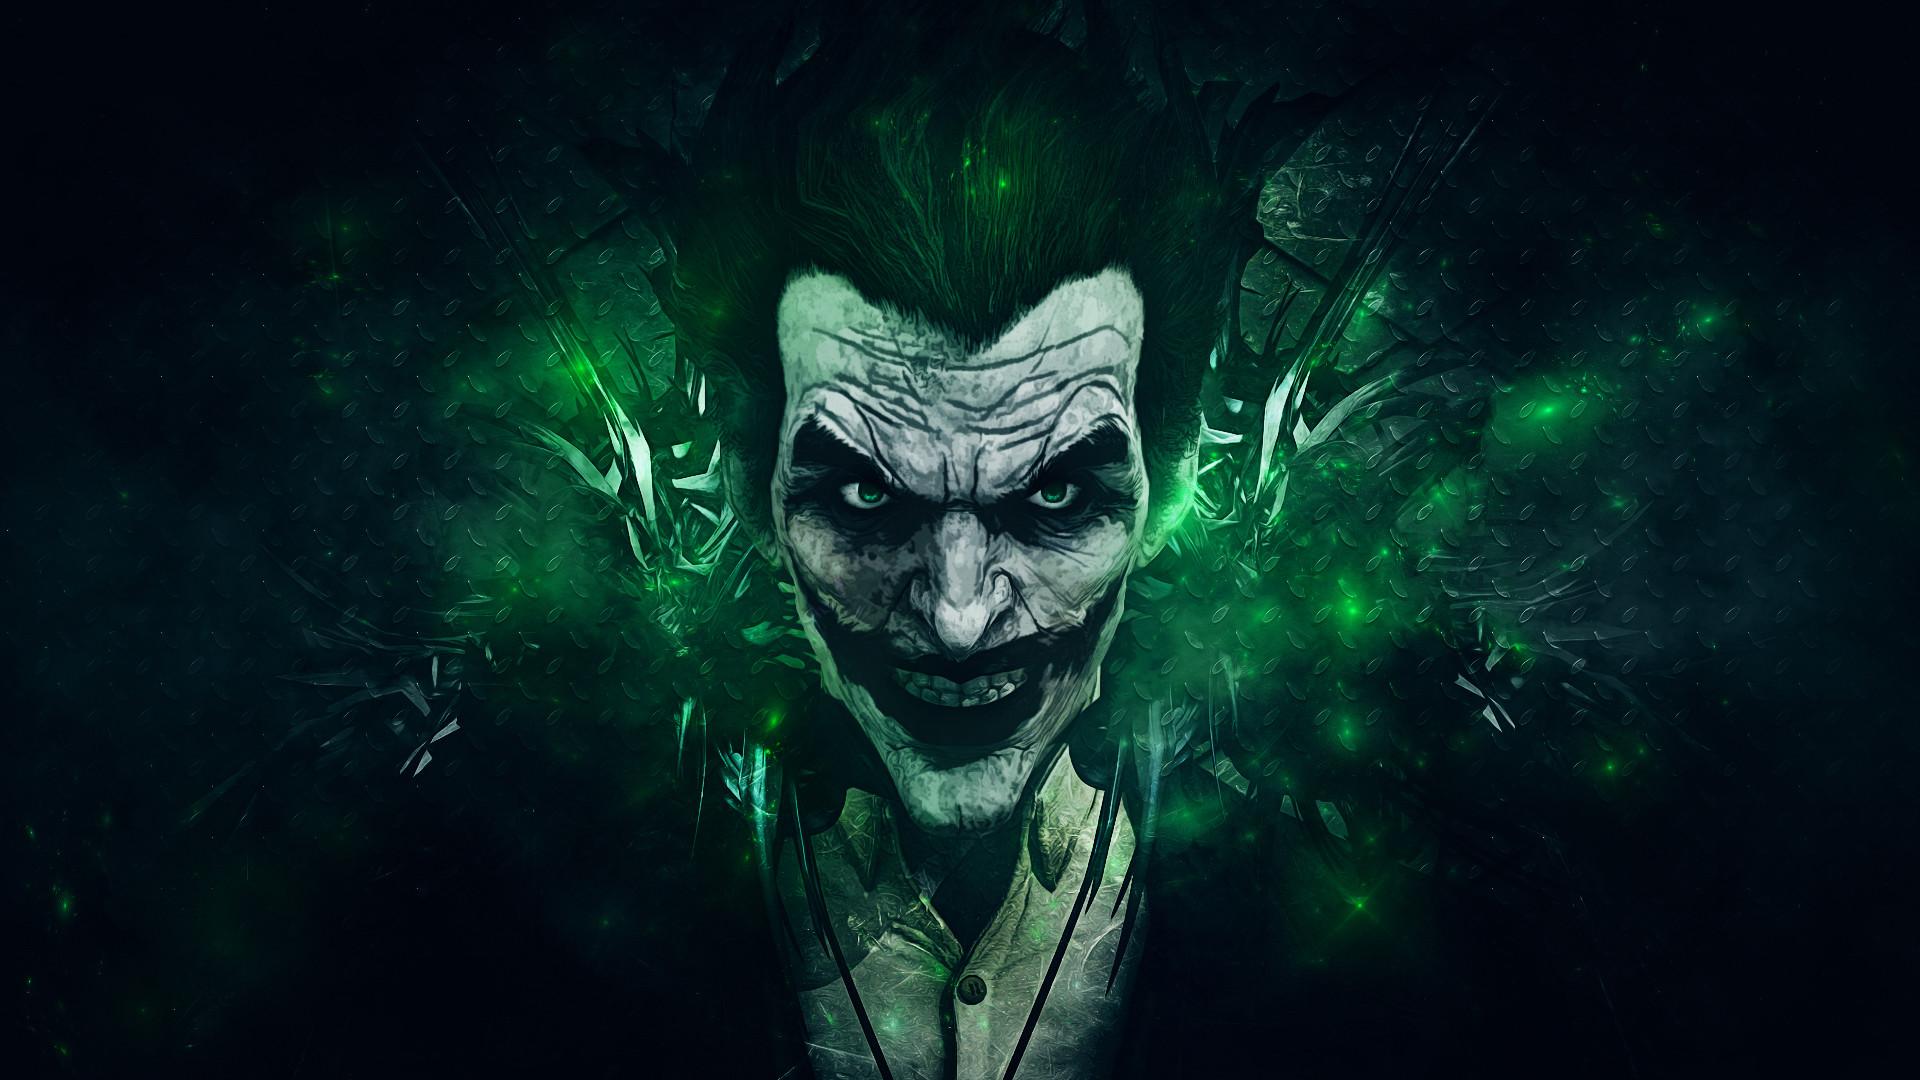 Joker Hd Wallpaper Wallpapertag